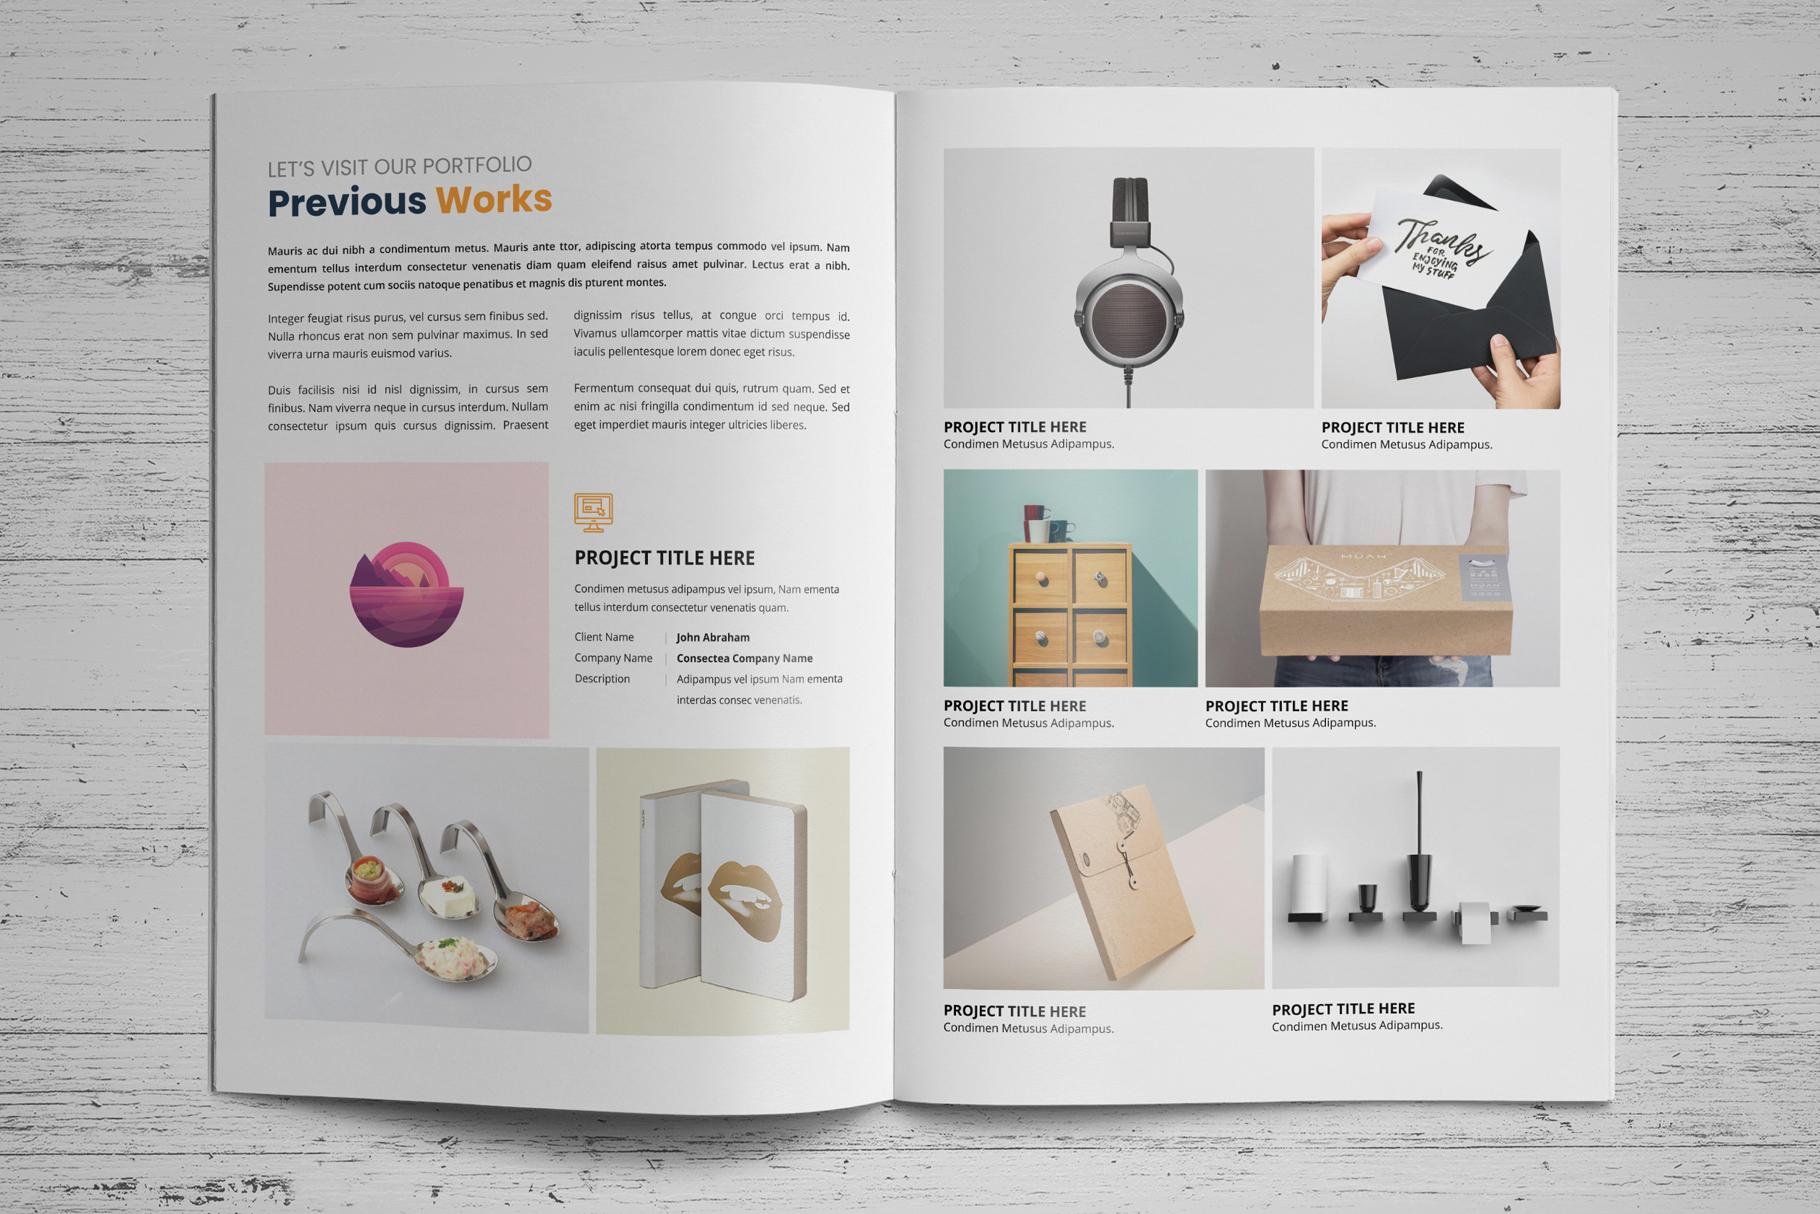 Portfolio Bifold Brochure Design v1 example image 4